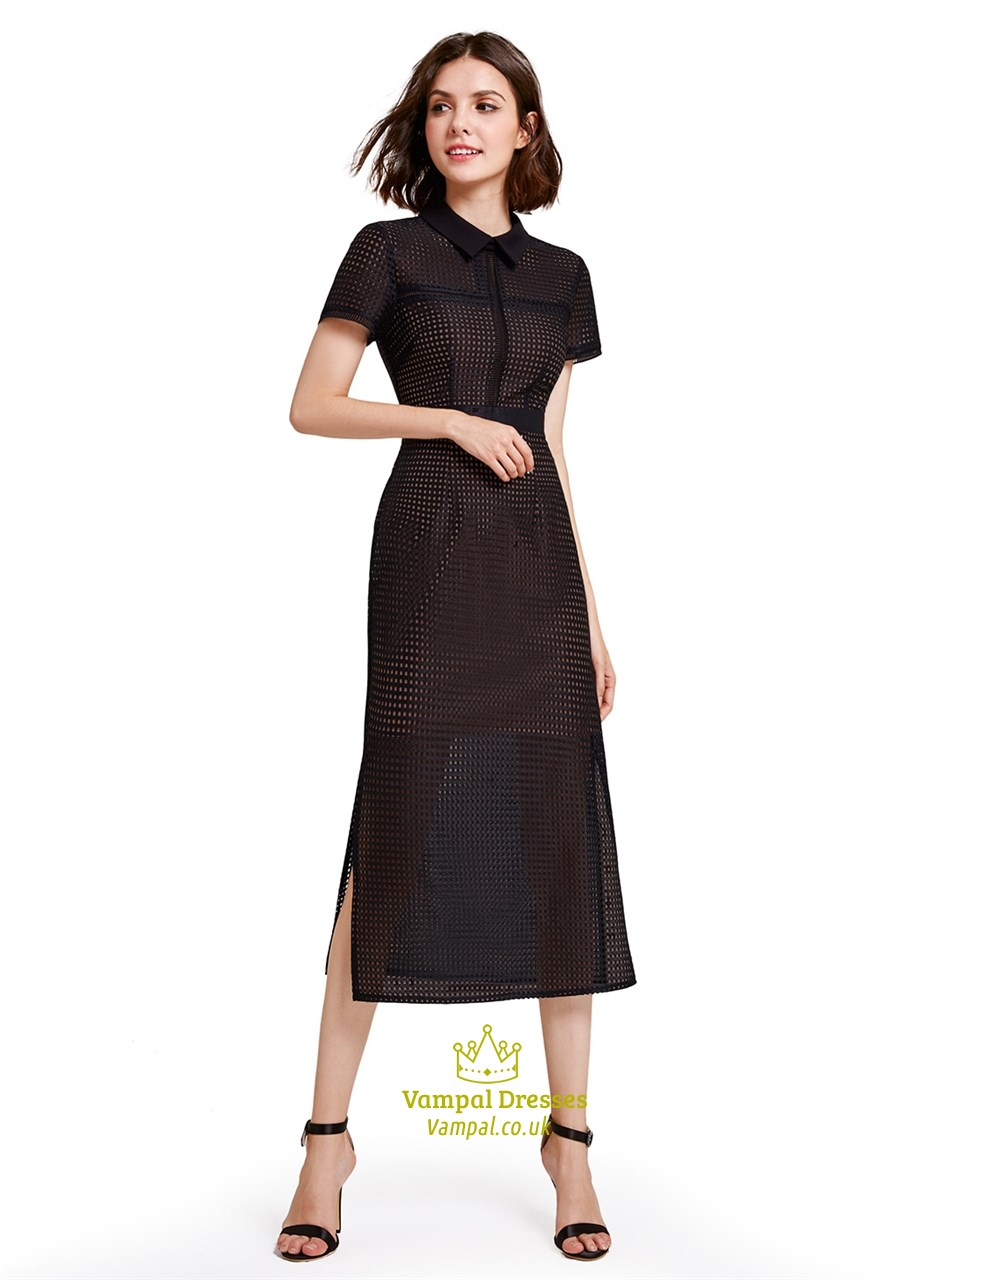 Short Sleeve Elegant Tea Length Black Sheath Dress With